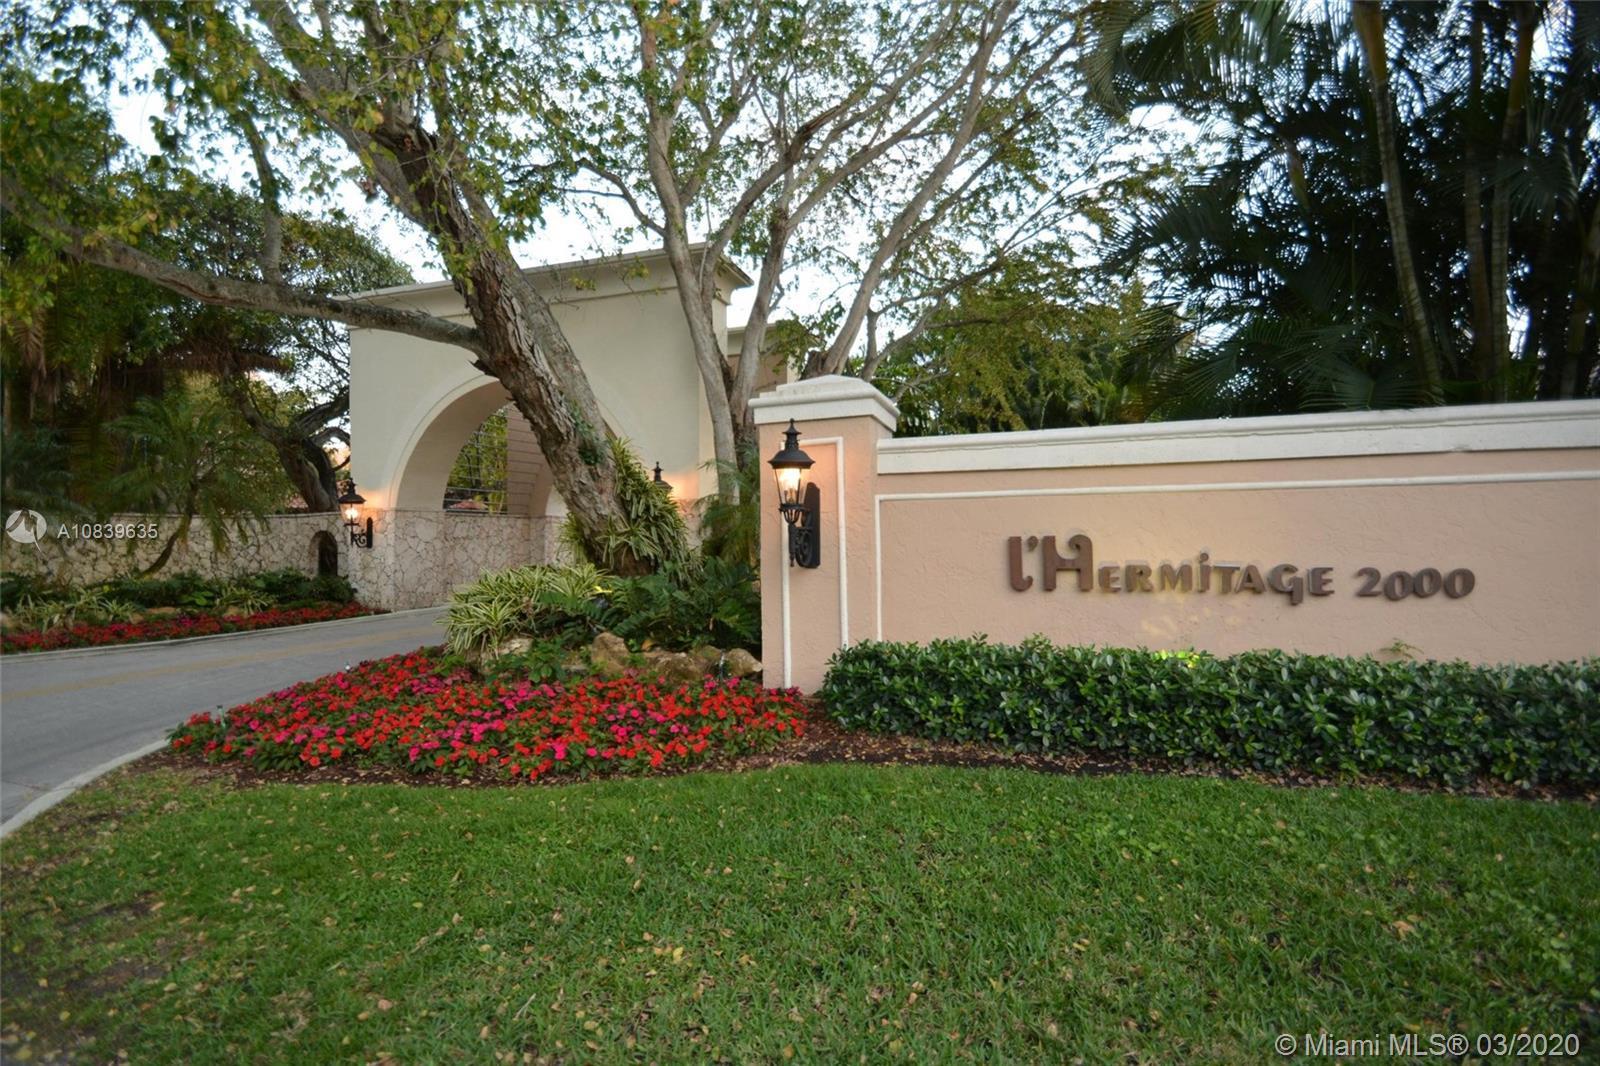 2000 S Bayshore Dr Unit#13, Miami, Florida 33133, 5 Bedrooms Bedrooms, ,4 BathroomsBathrooms,Residential,For Sale,2000 S Bayshore Dr Unit#13,A10839635